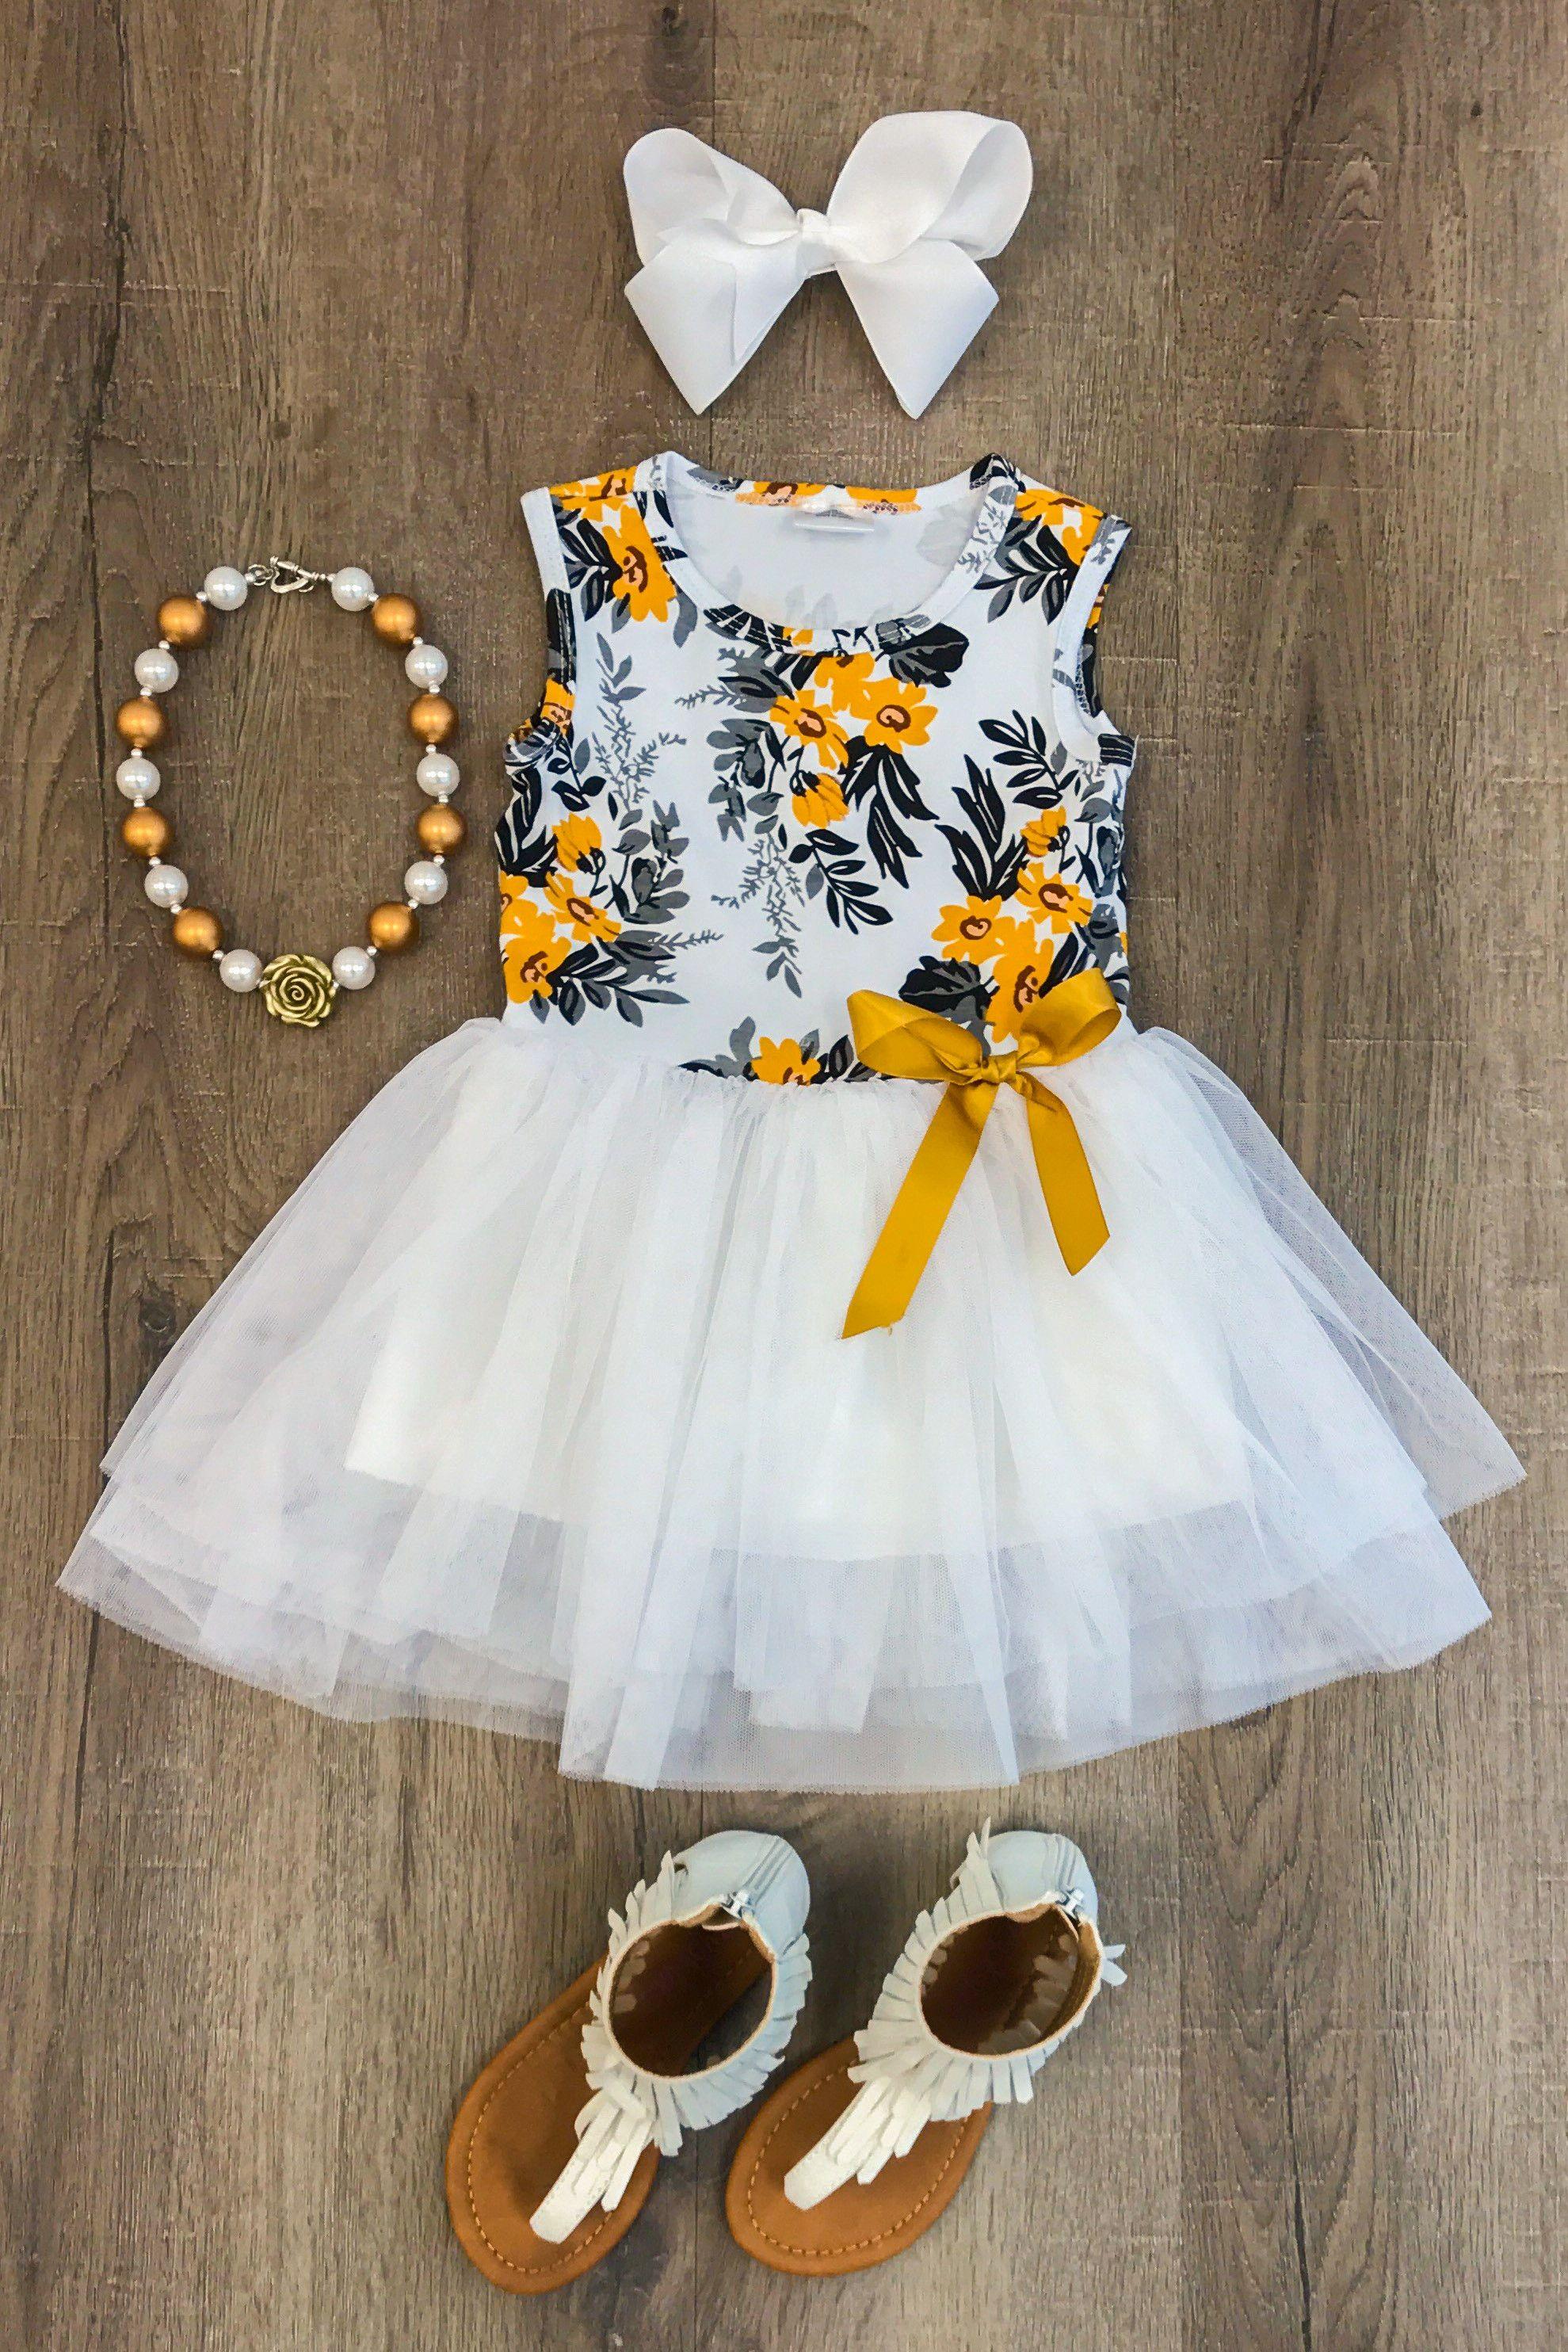 Mustard and Gray Floral Tutu Dress